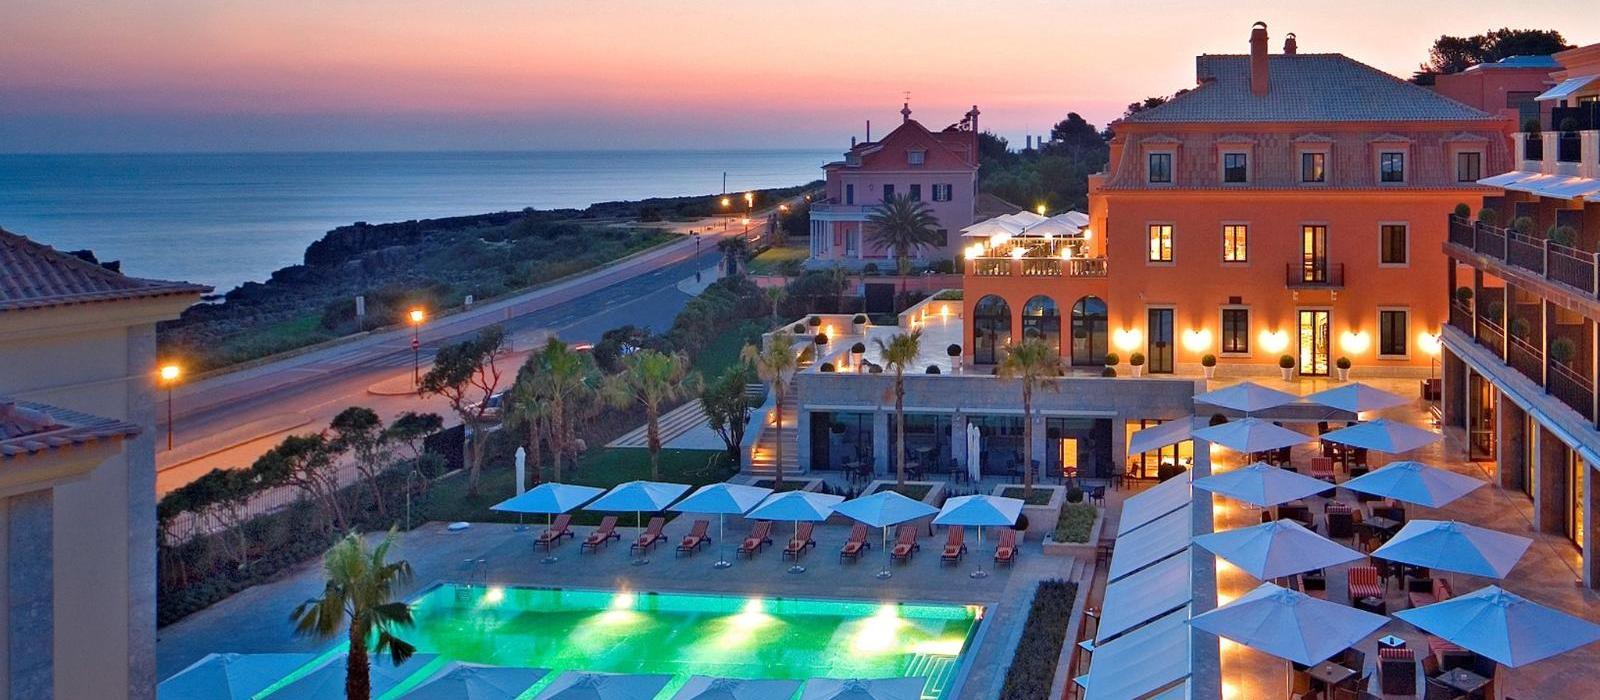 意大利皇家别墅水疗酒店(Grande Real Villa Itália Hotel & Spa) 图片  www.lhw.cn